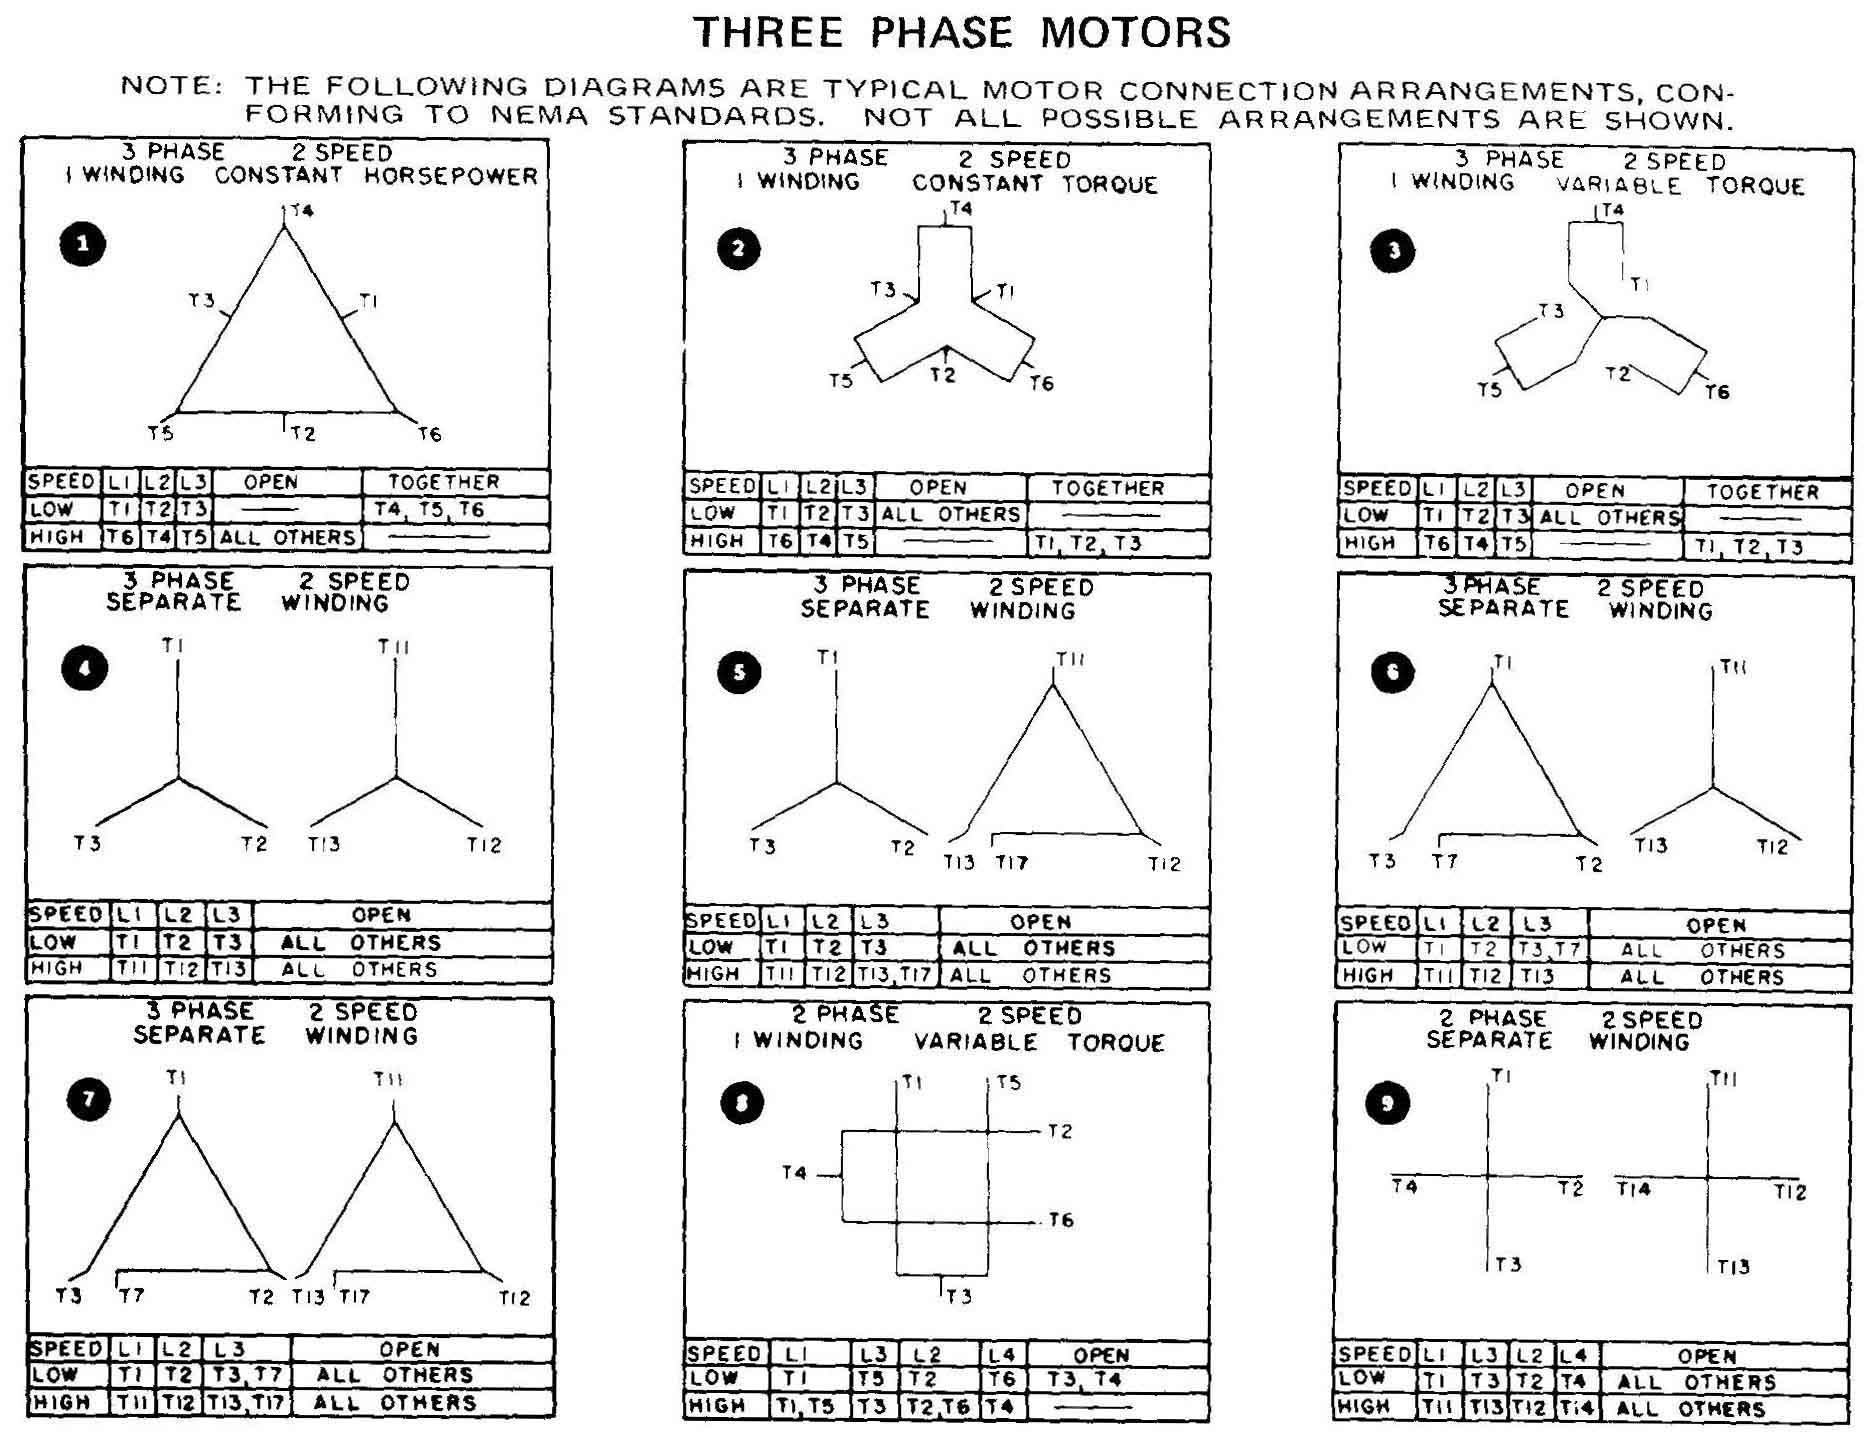 12 lead motor wiring schematic